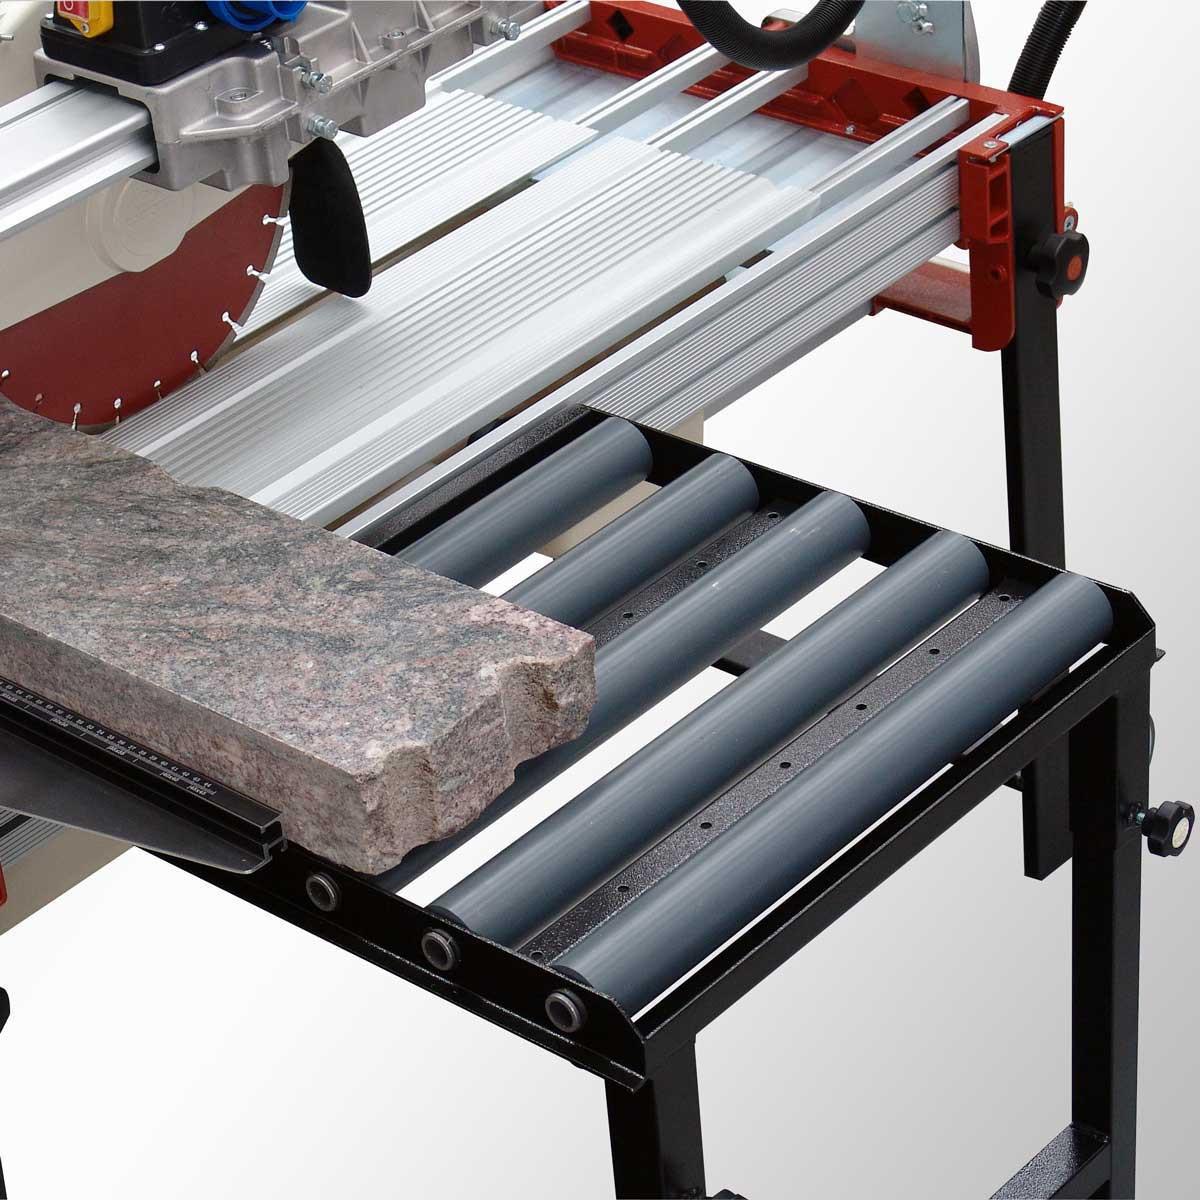 Raimondi rail saw rolling extension table